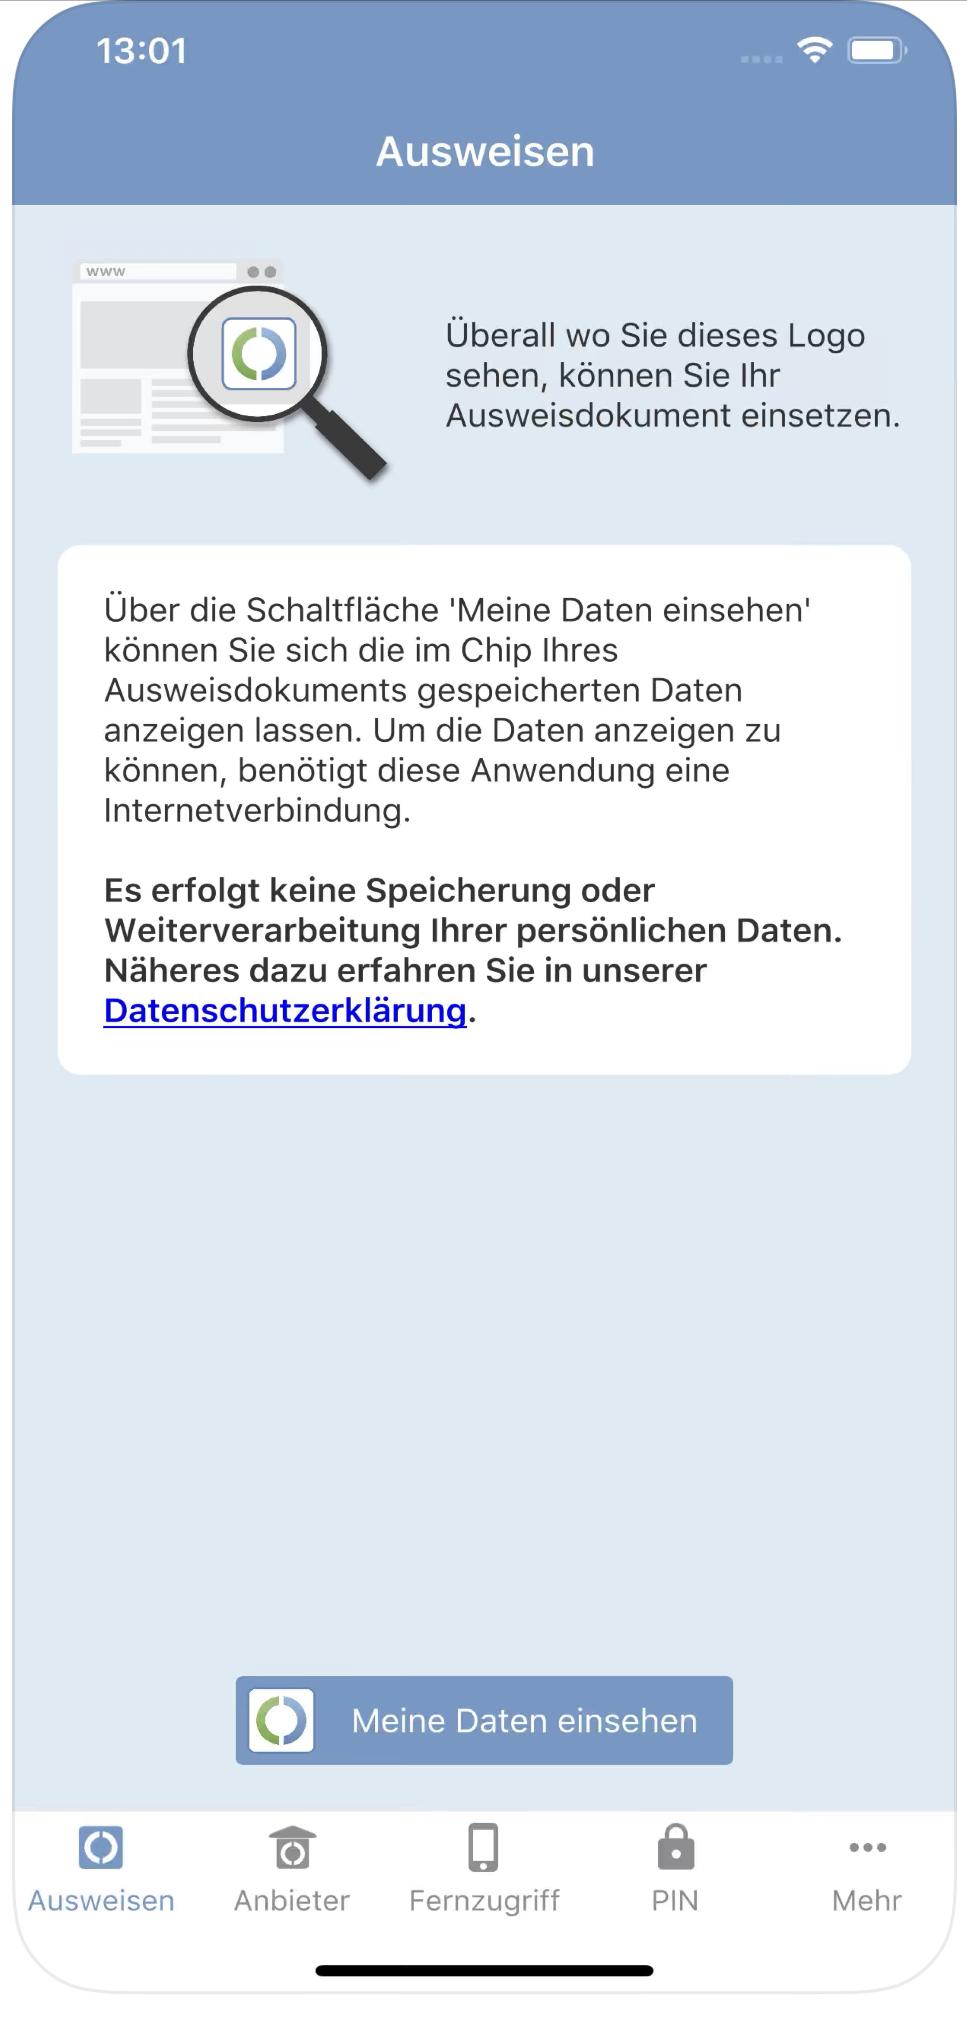 Personalausweis – Online-Ausweisfunktion auch für iOS-Geräte